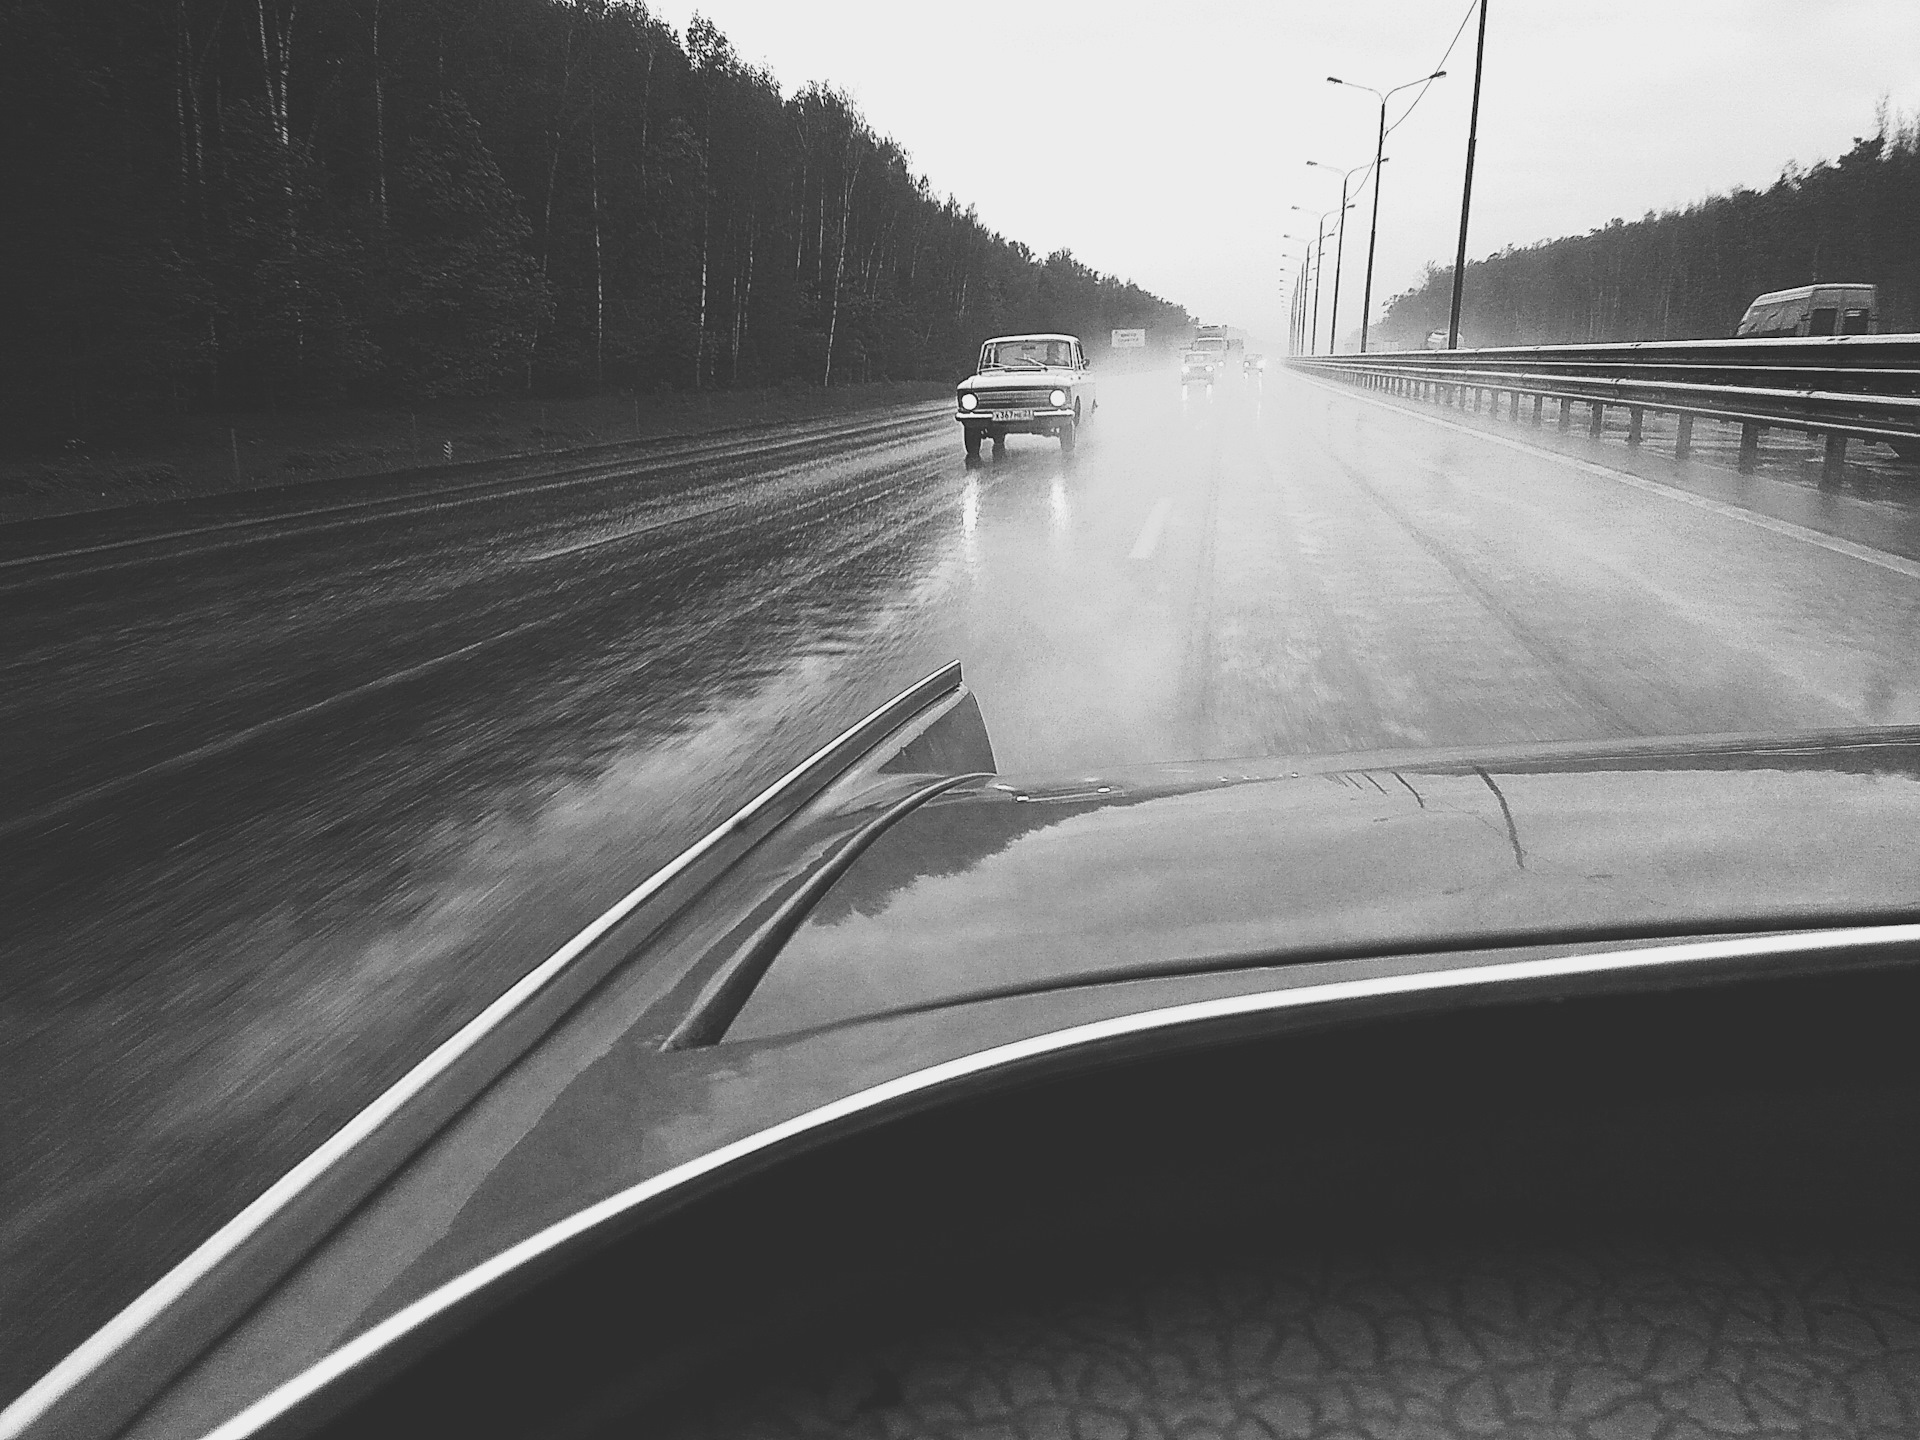 картинки дорога москва тула одном